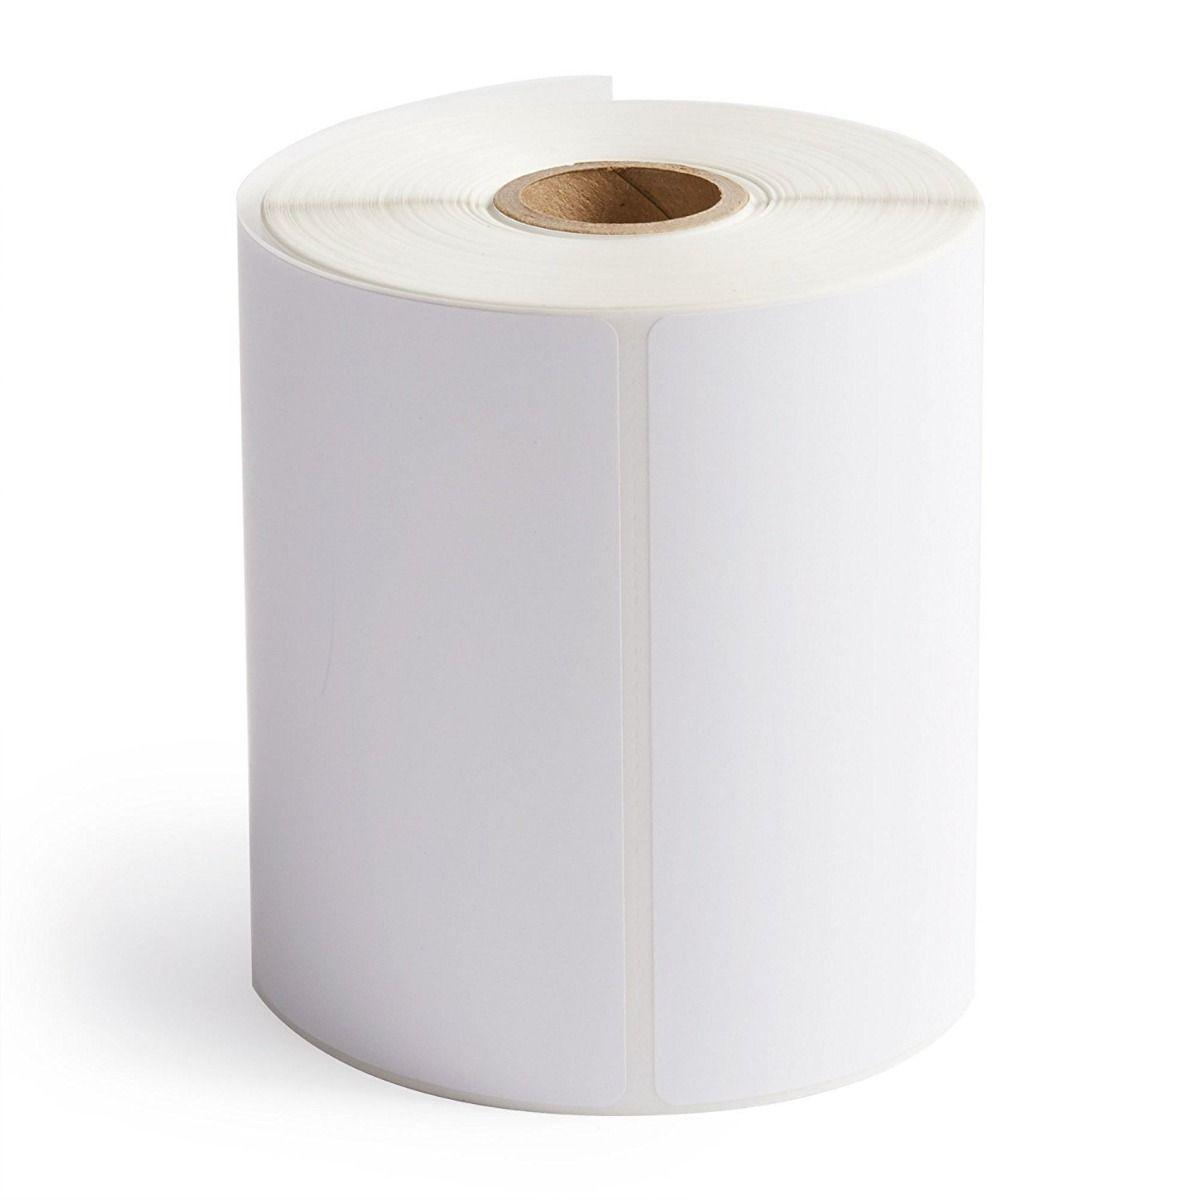 "4"" x 8"" White Matte Paper - Thermal Transfer Labels - 1"" Core"